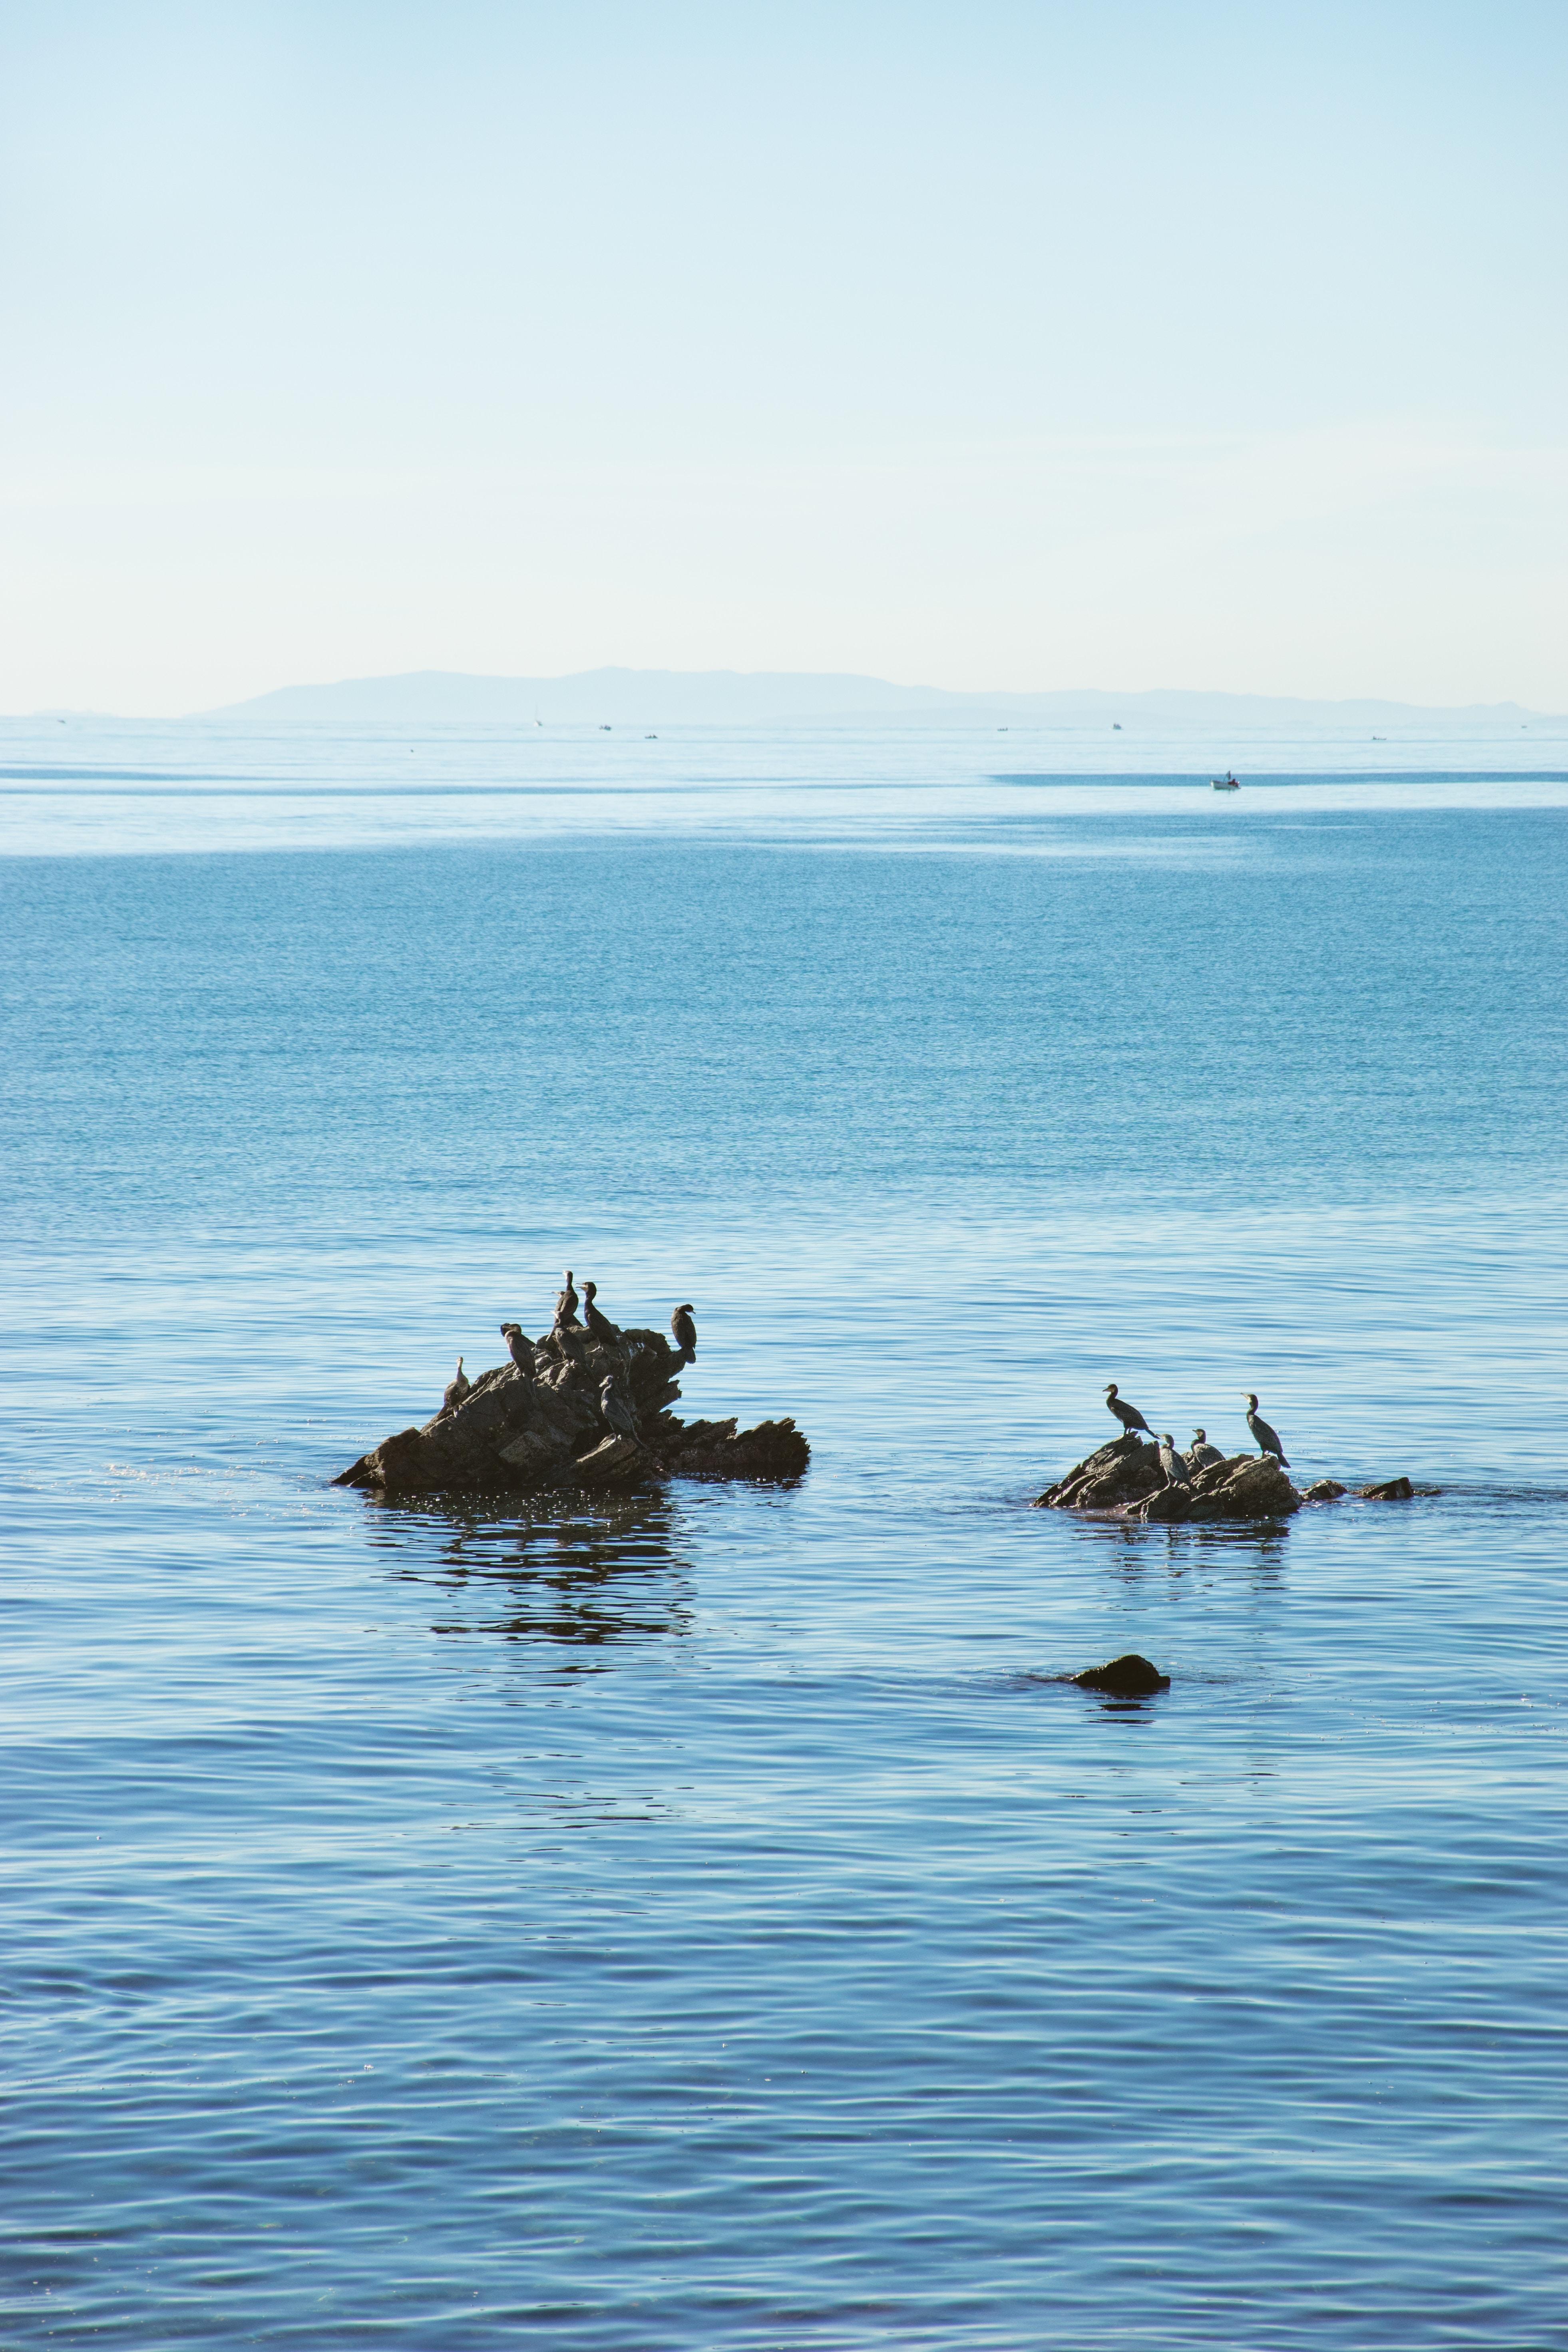 flock of birds perching on rock formation